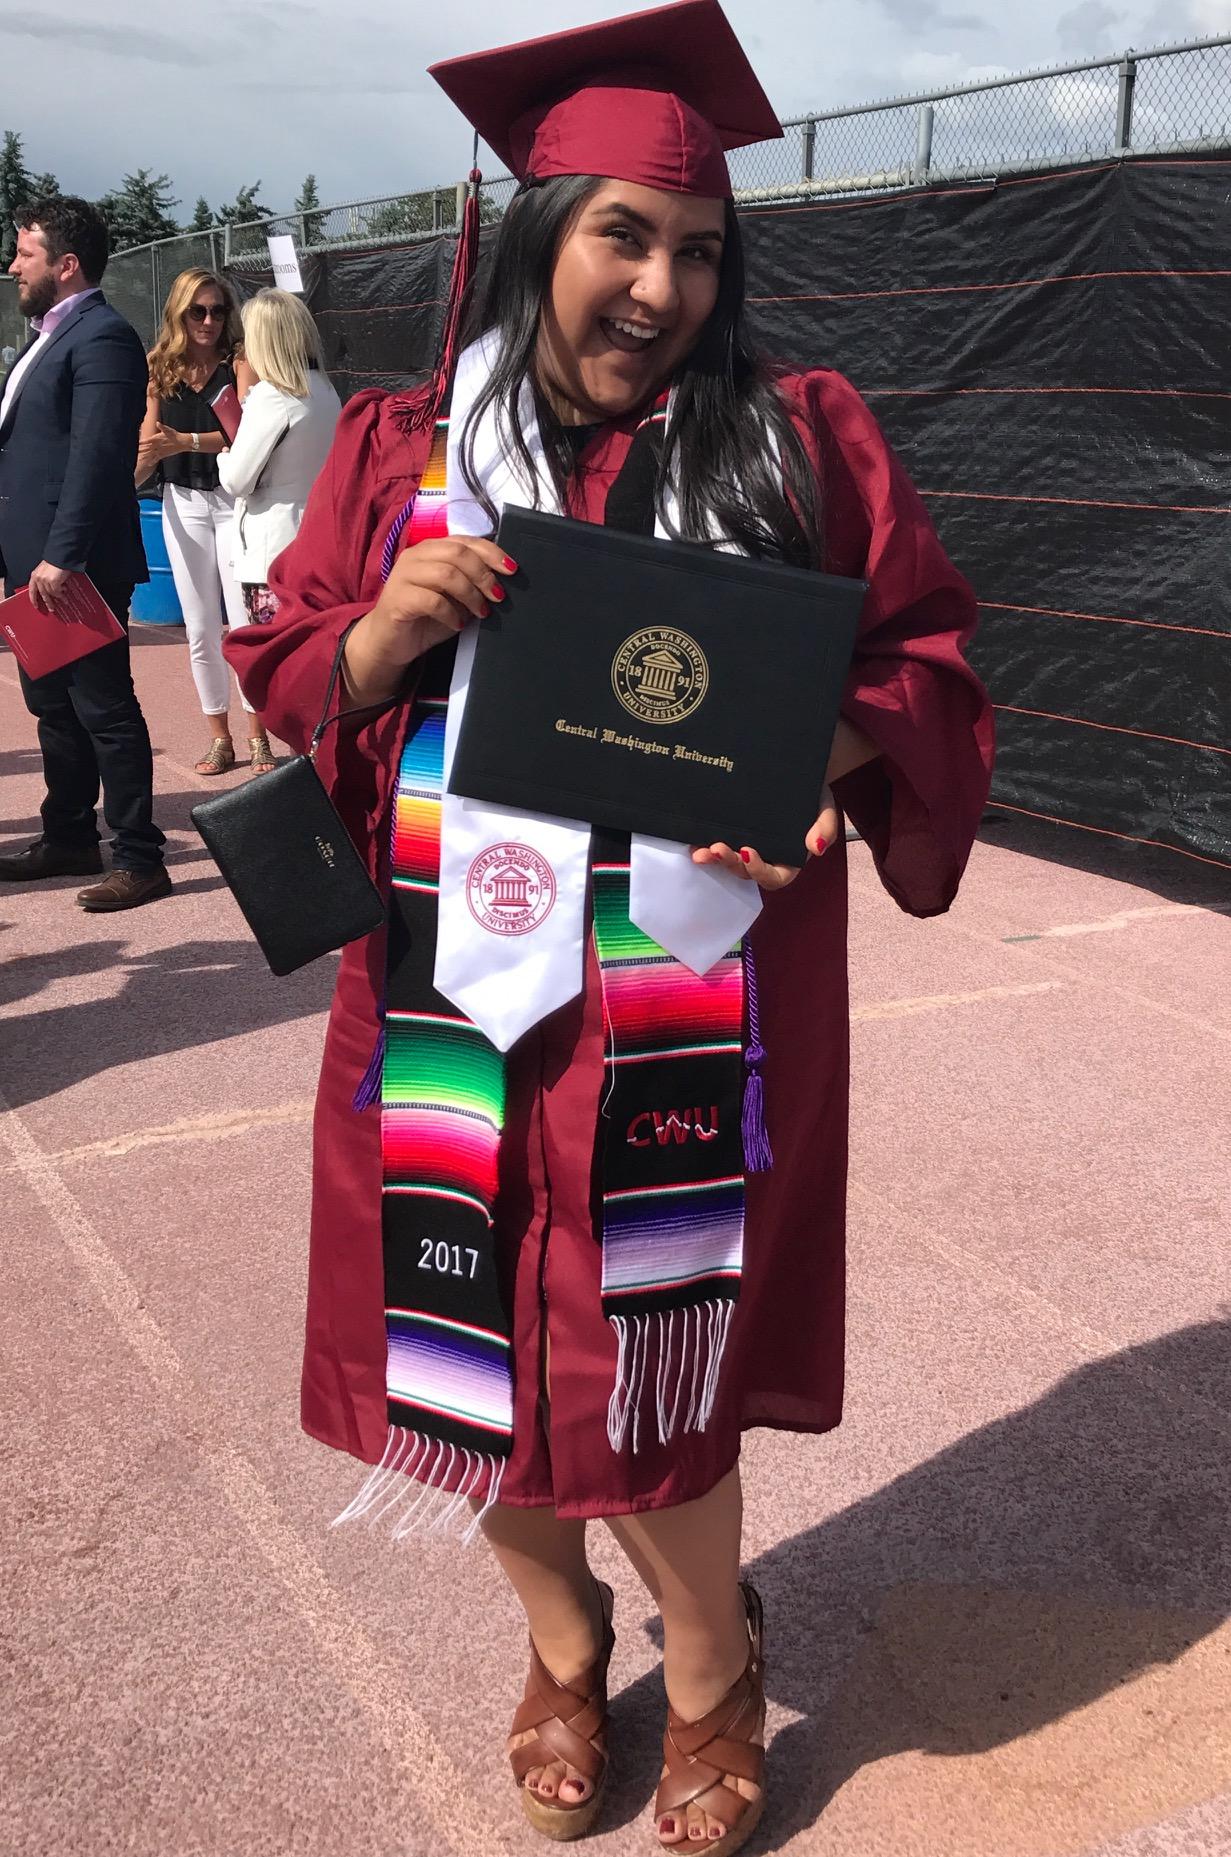 Madai Martinez, Central Washinton University